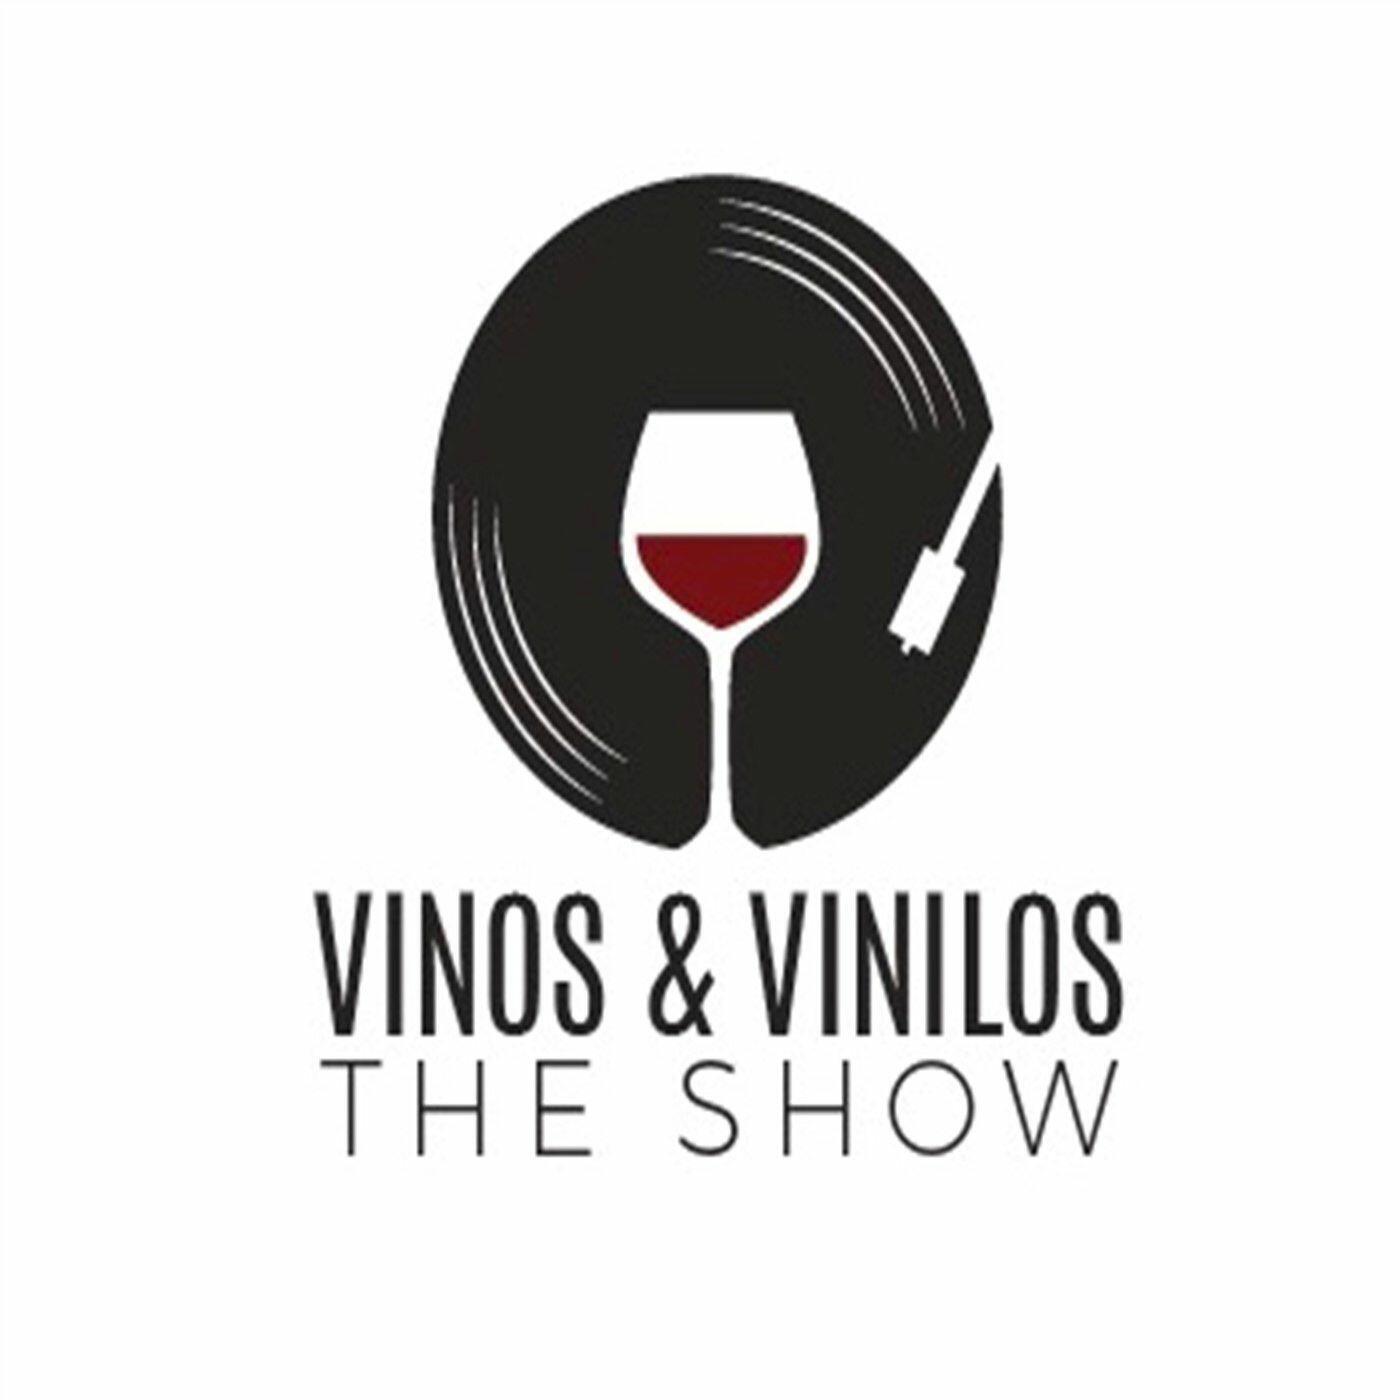 Vinos & Vinilos The show